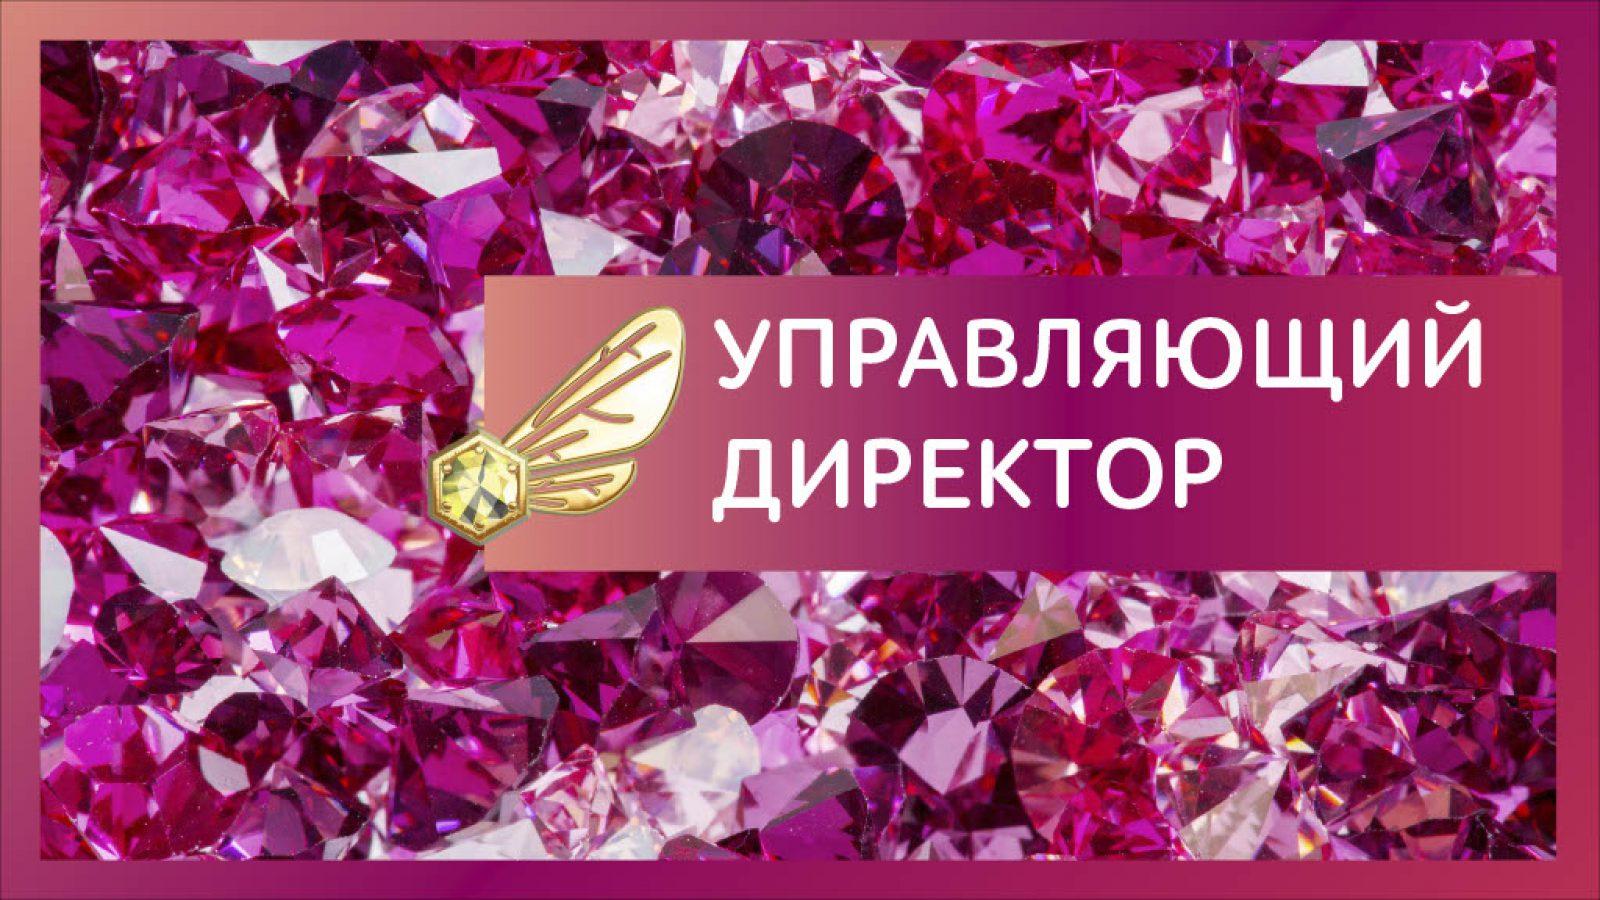 SHTV-2020-_-E-TL-TBTV-TVTGTBTL-TL-TB-TB-_69-TBTVTA1024_59